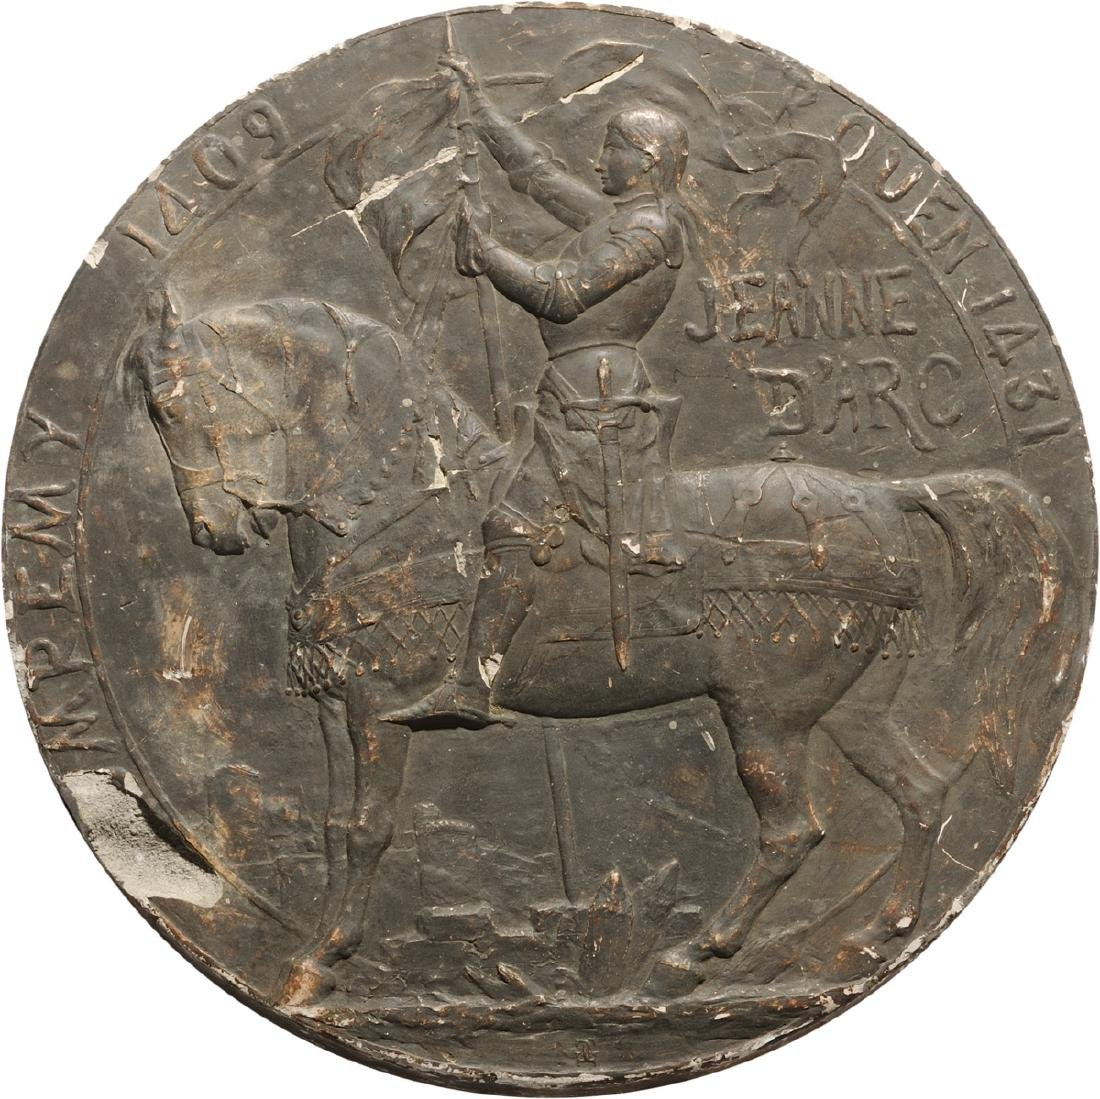 Jeanne D'Arc plaster Plaque, beginning of 20th